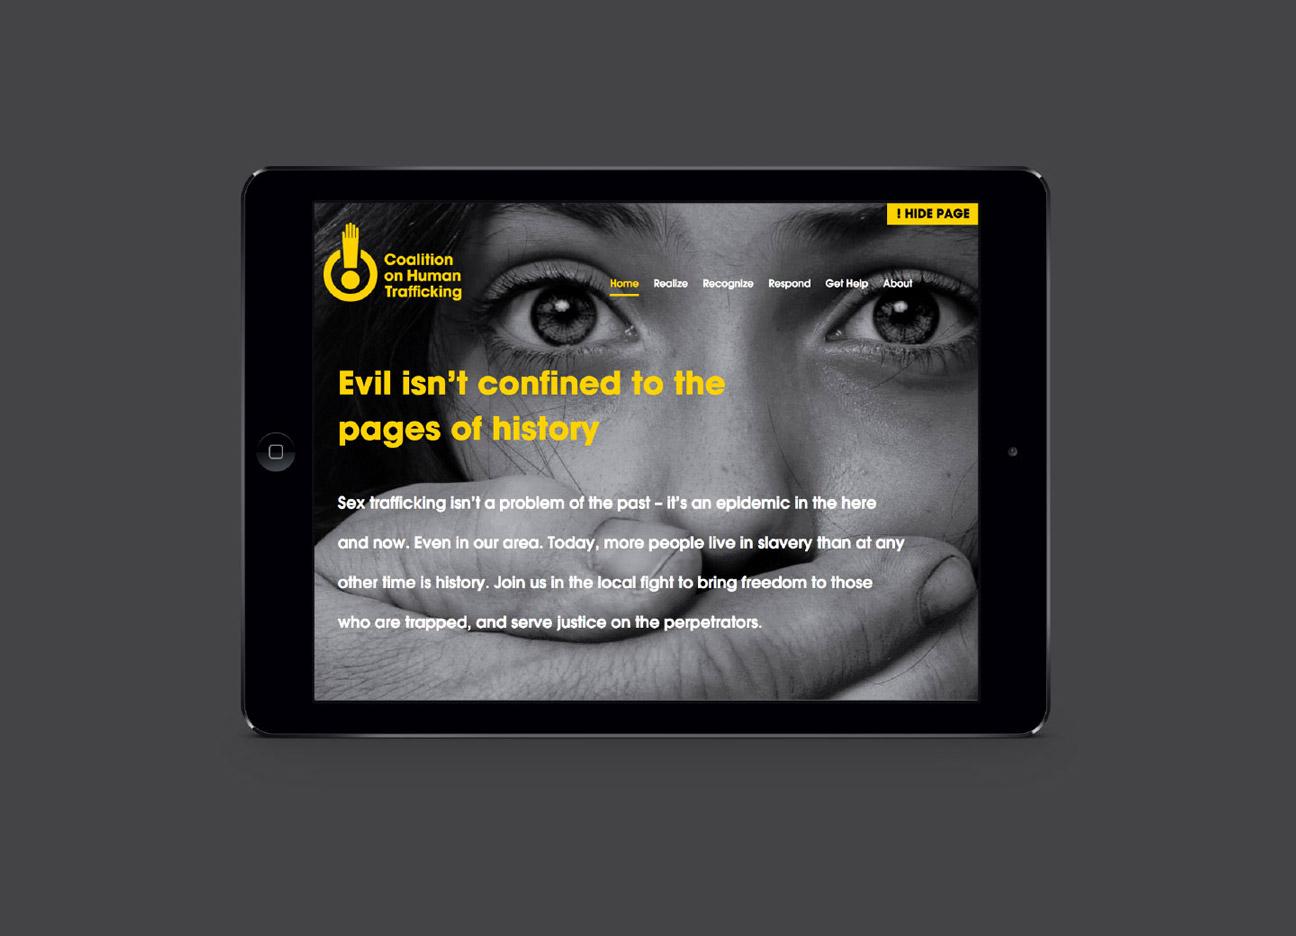 Coalition on Human Trafficking